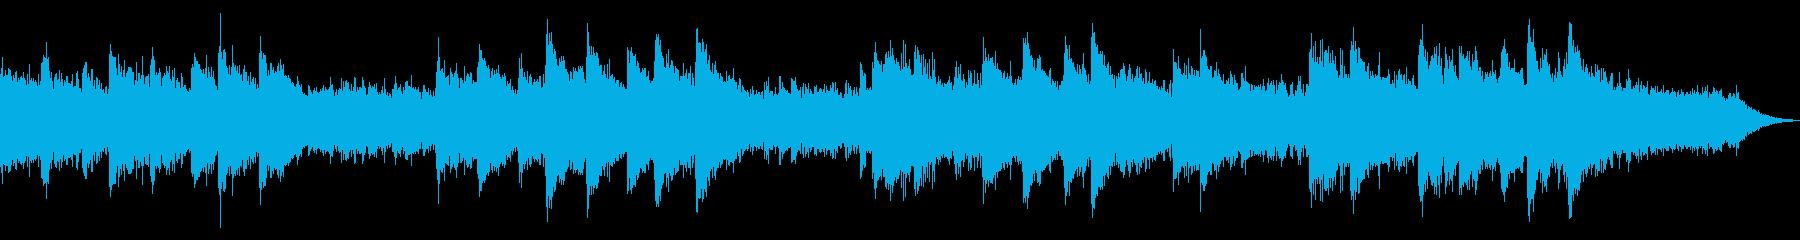 Holiday Beach30秒ライト版の再生済みの波形